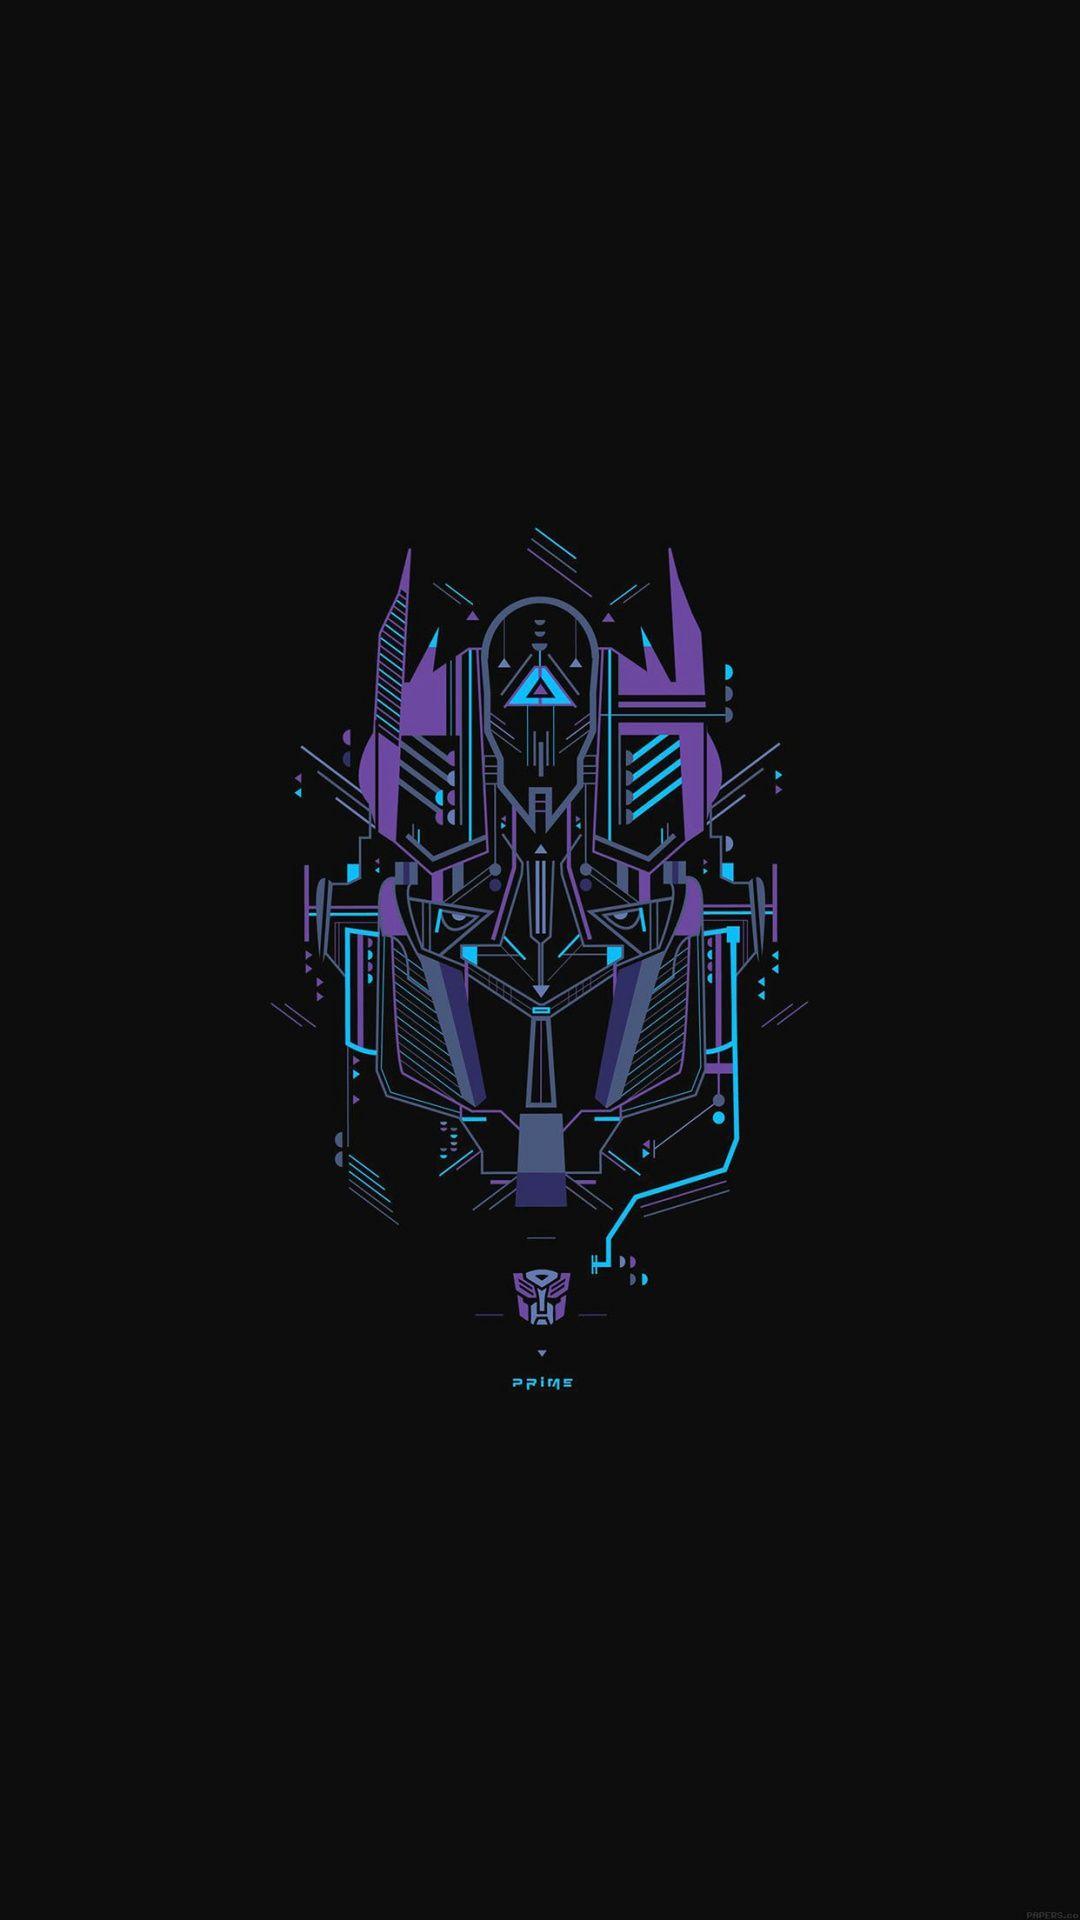 Amoled Wallpaper 5 Transformer logo Optimus prime wallpaper 1080x1920